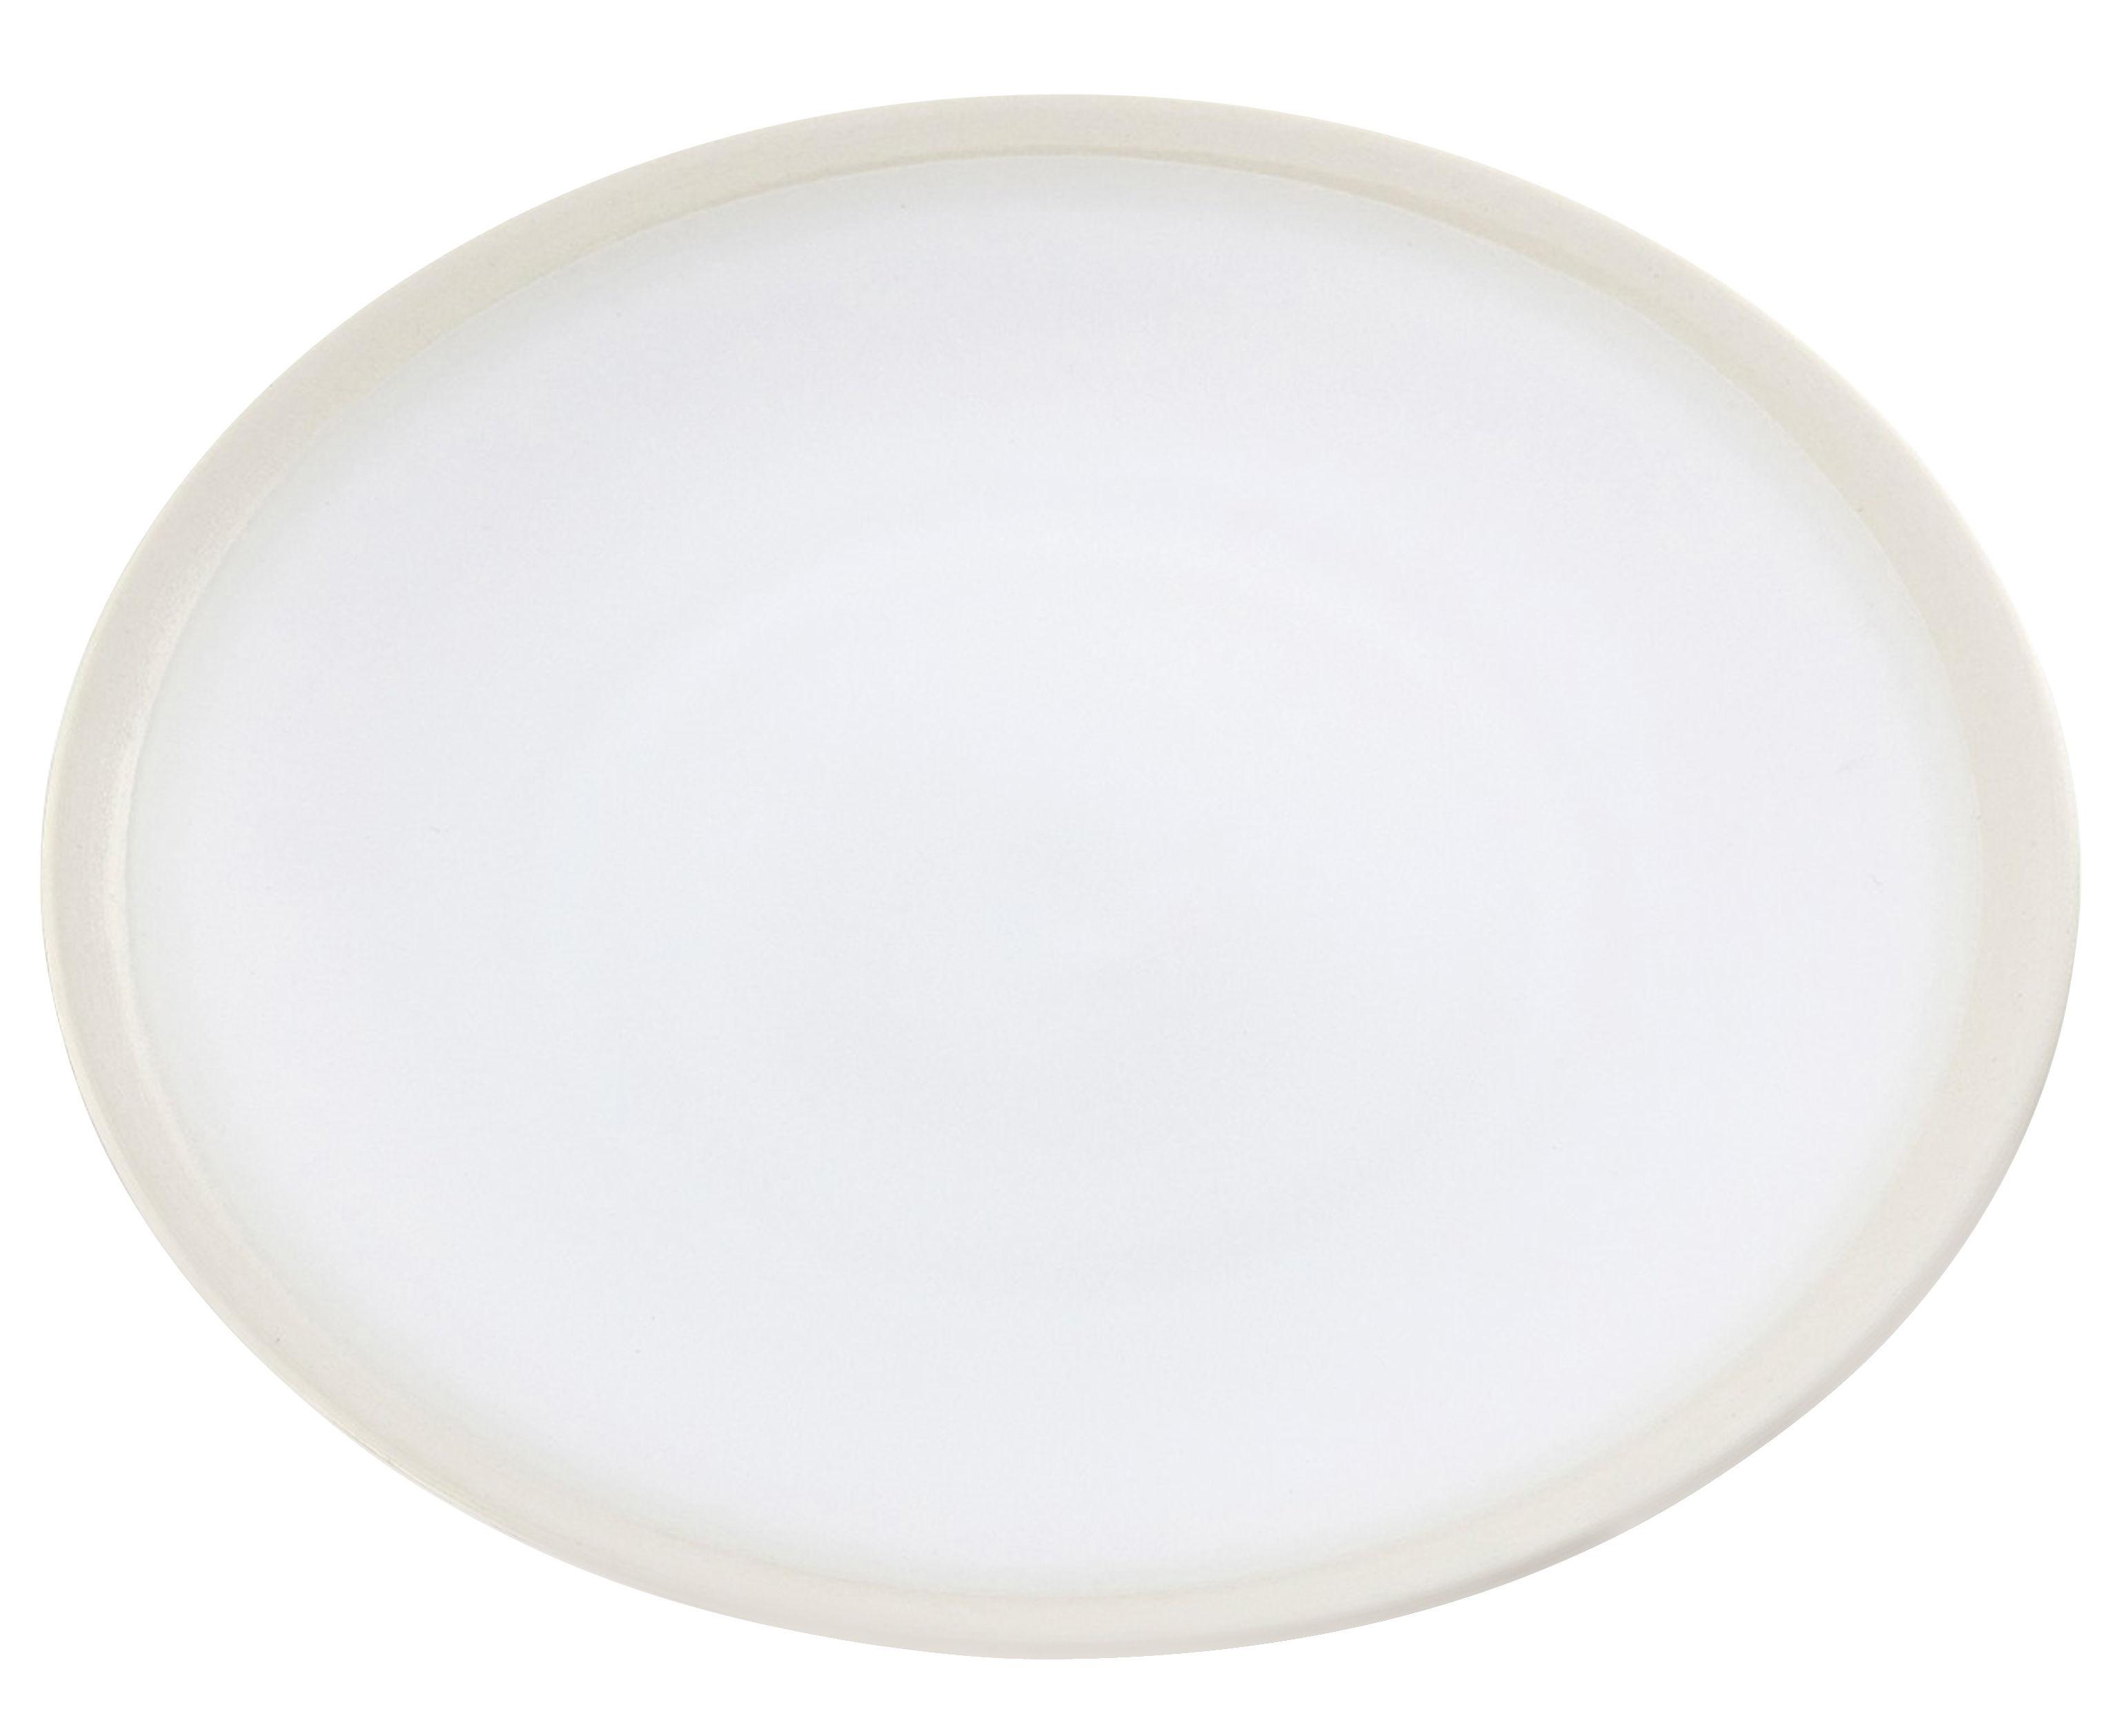 Tableware - Plates - Sicilia Plate - Ø 26 cm by Maison Sarah Lavoine - Jasmin / Beige - Painted enameled stoneware